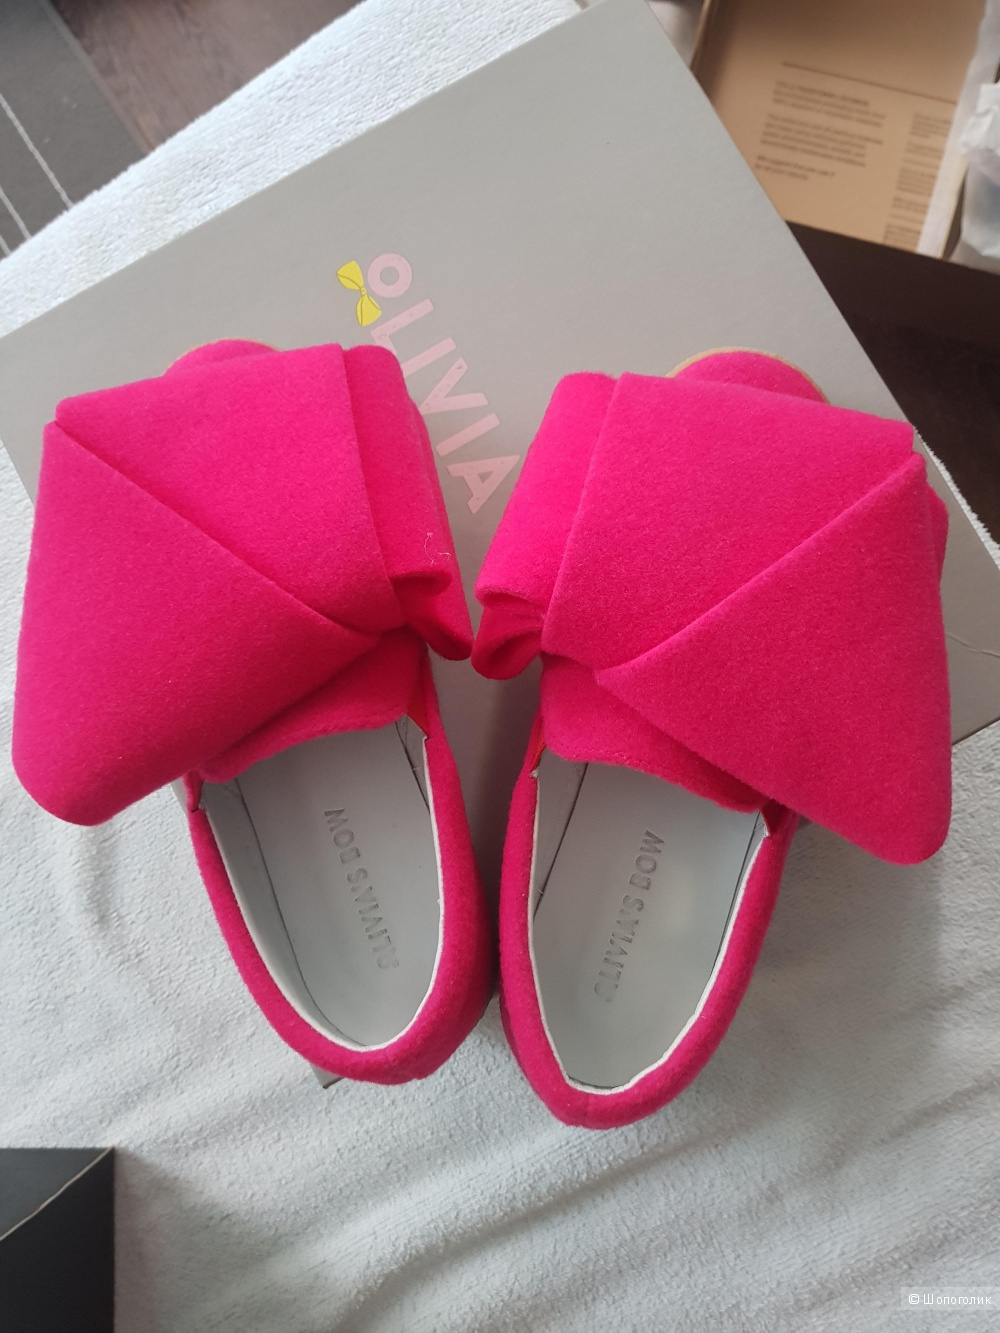 Слипоны Olivia's bow, 36 размер